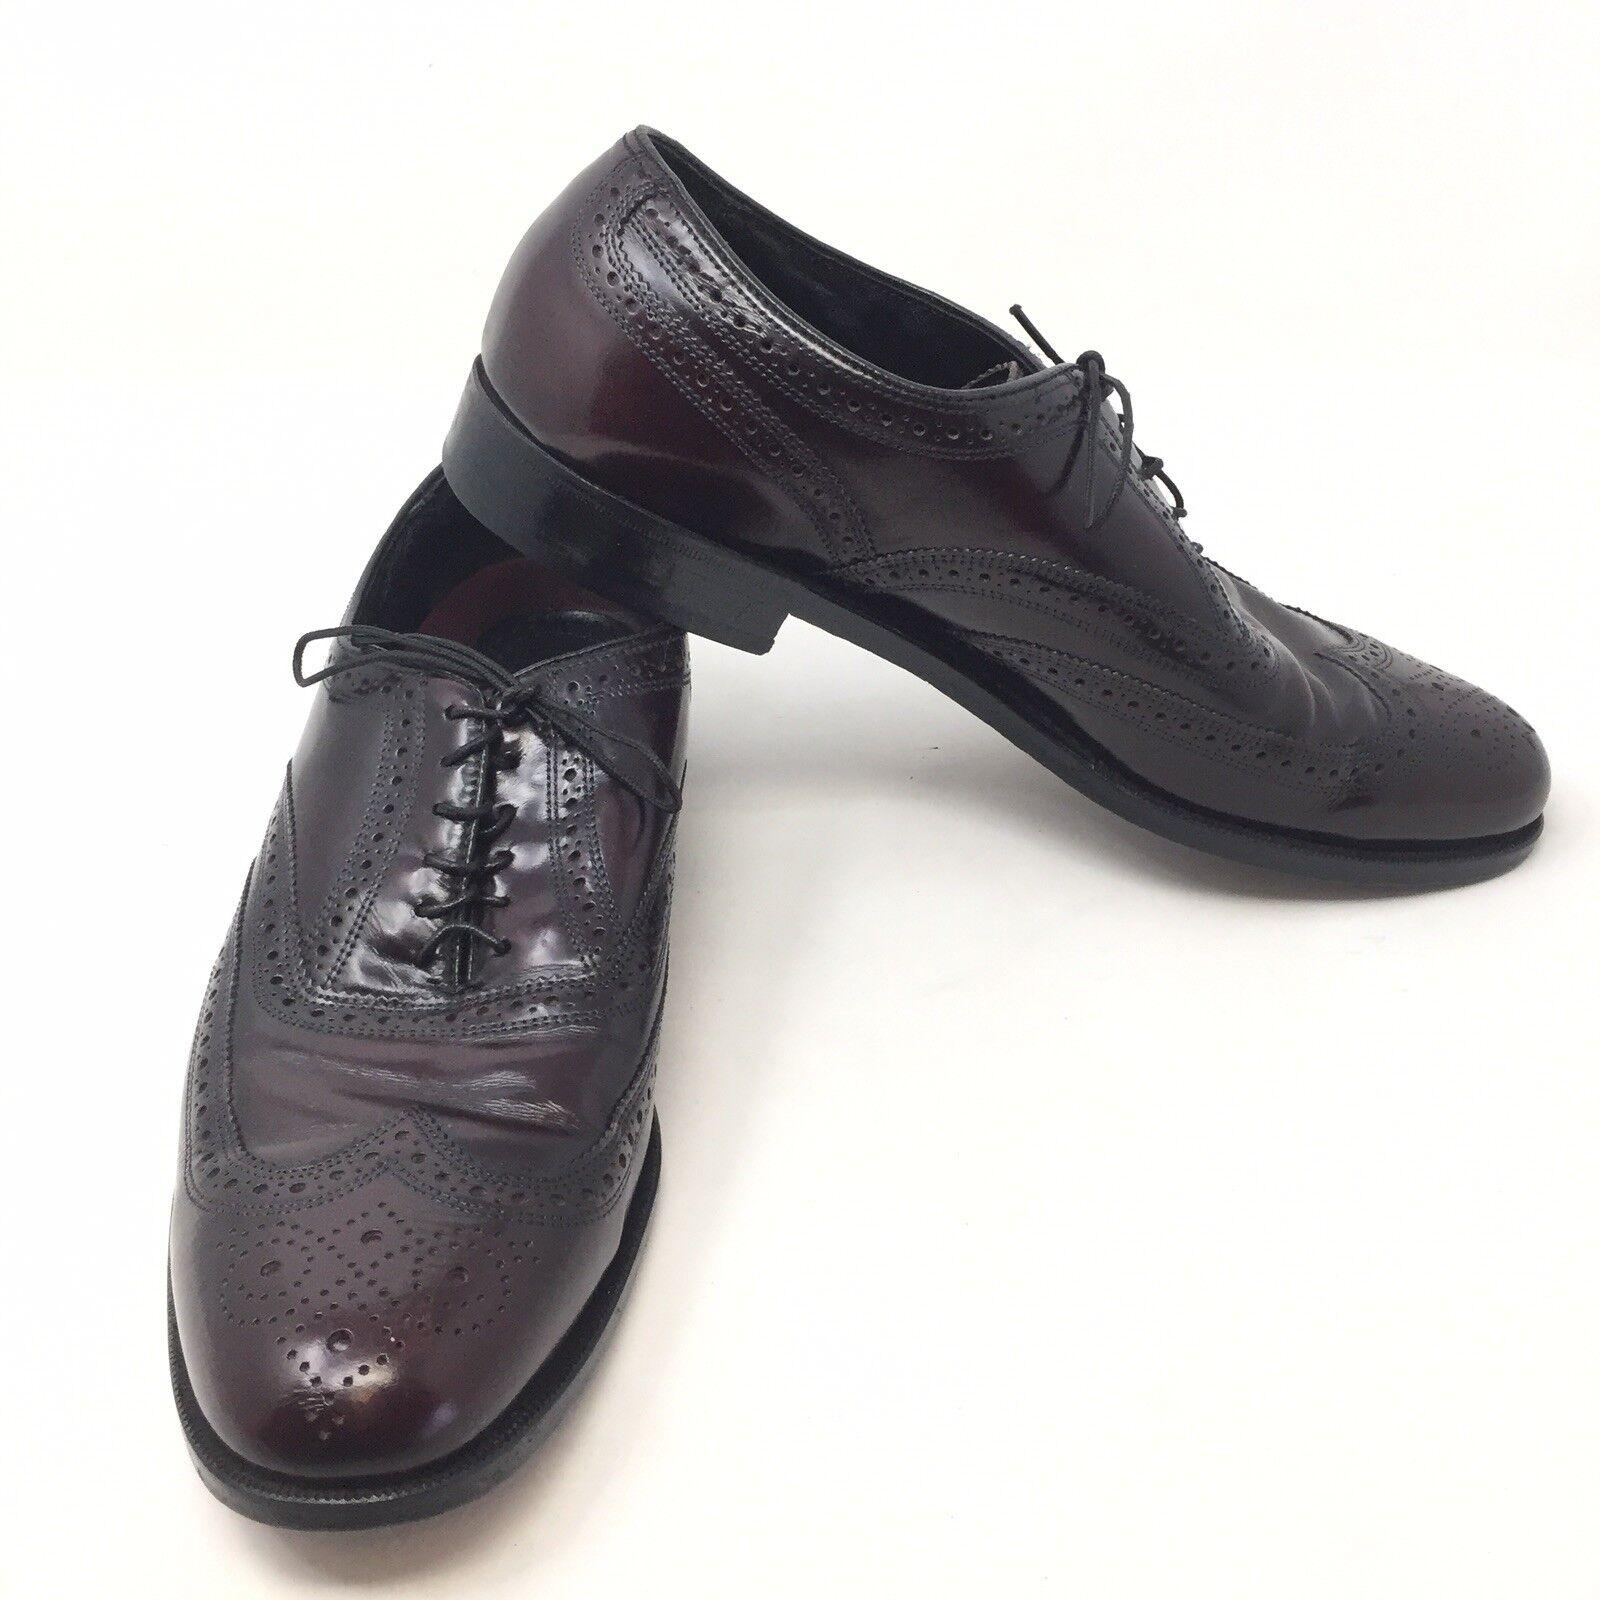 Vintage Florsheim Burgundy Sz 9.5 D Wing Tip Oxfords Dress sautope Leather B1A Sautope classeiche da uomo